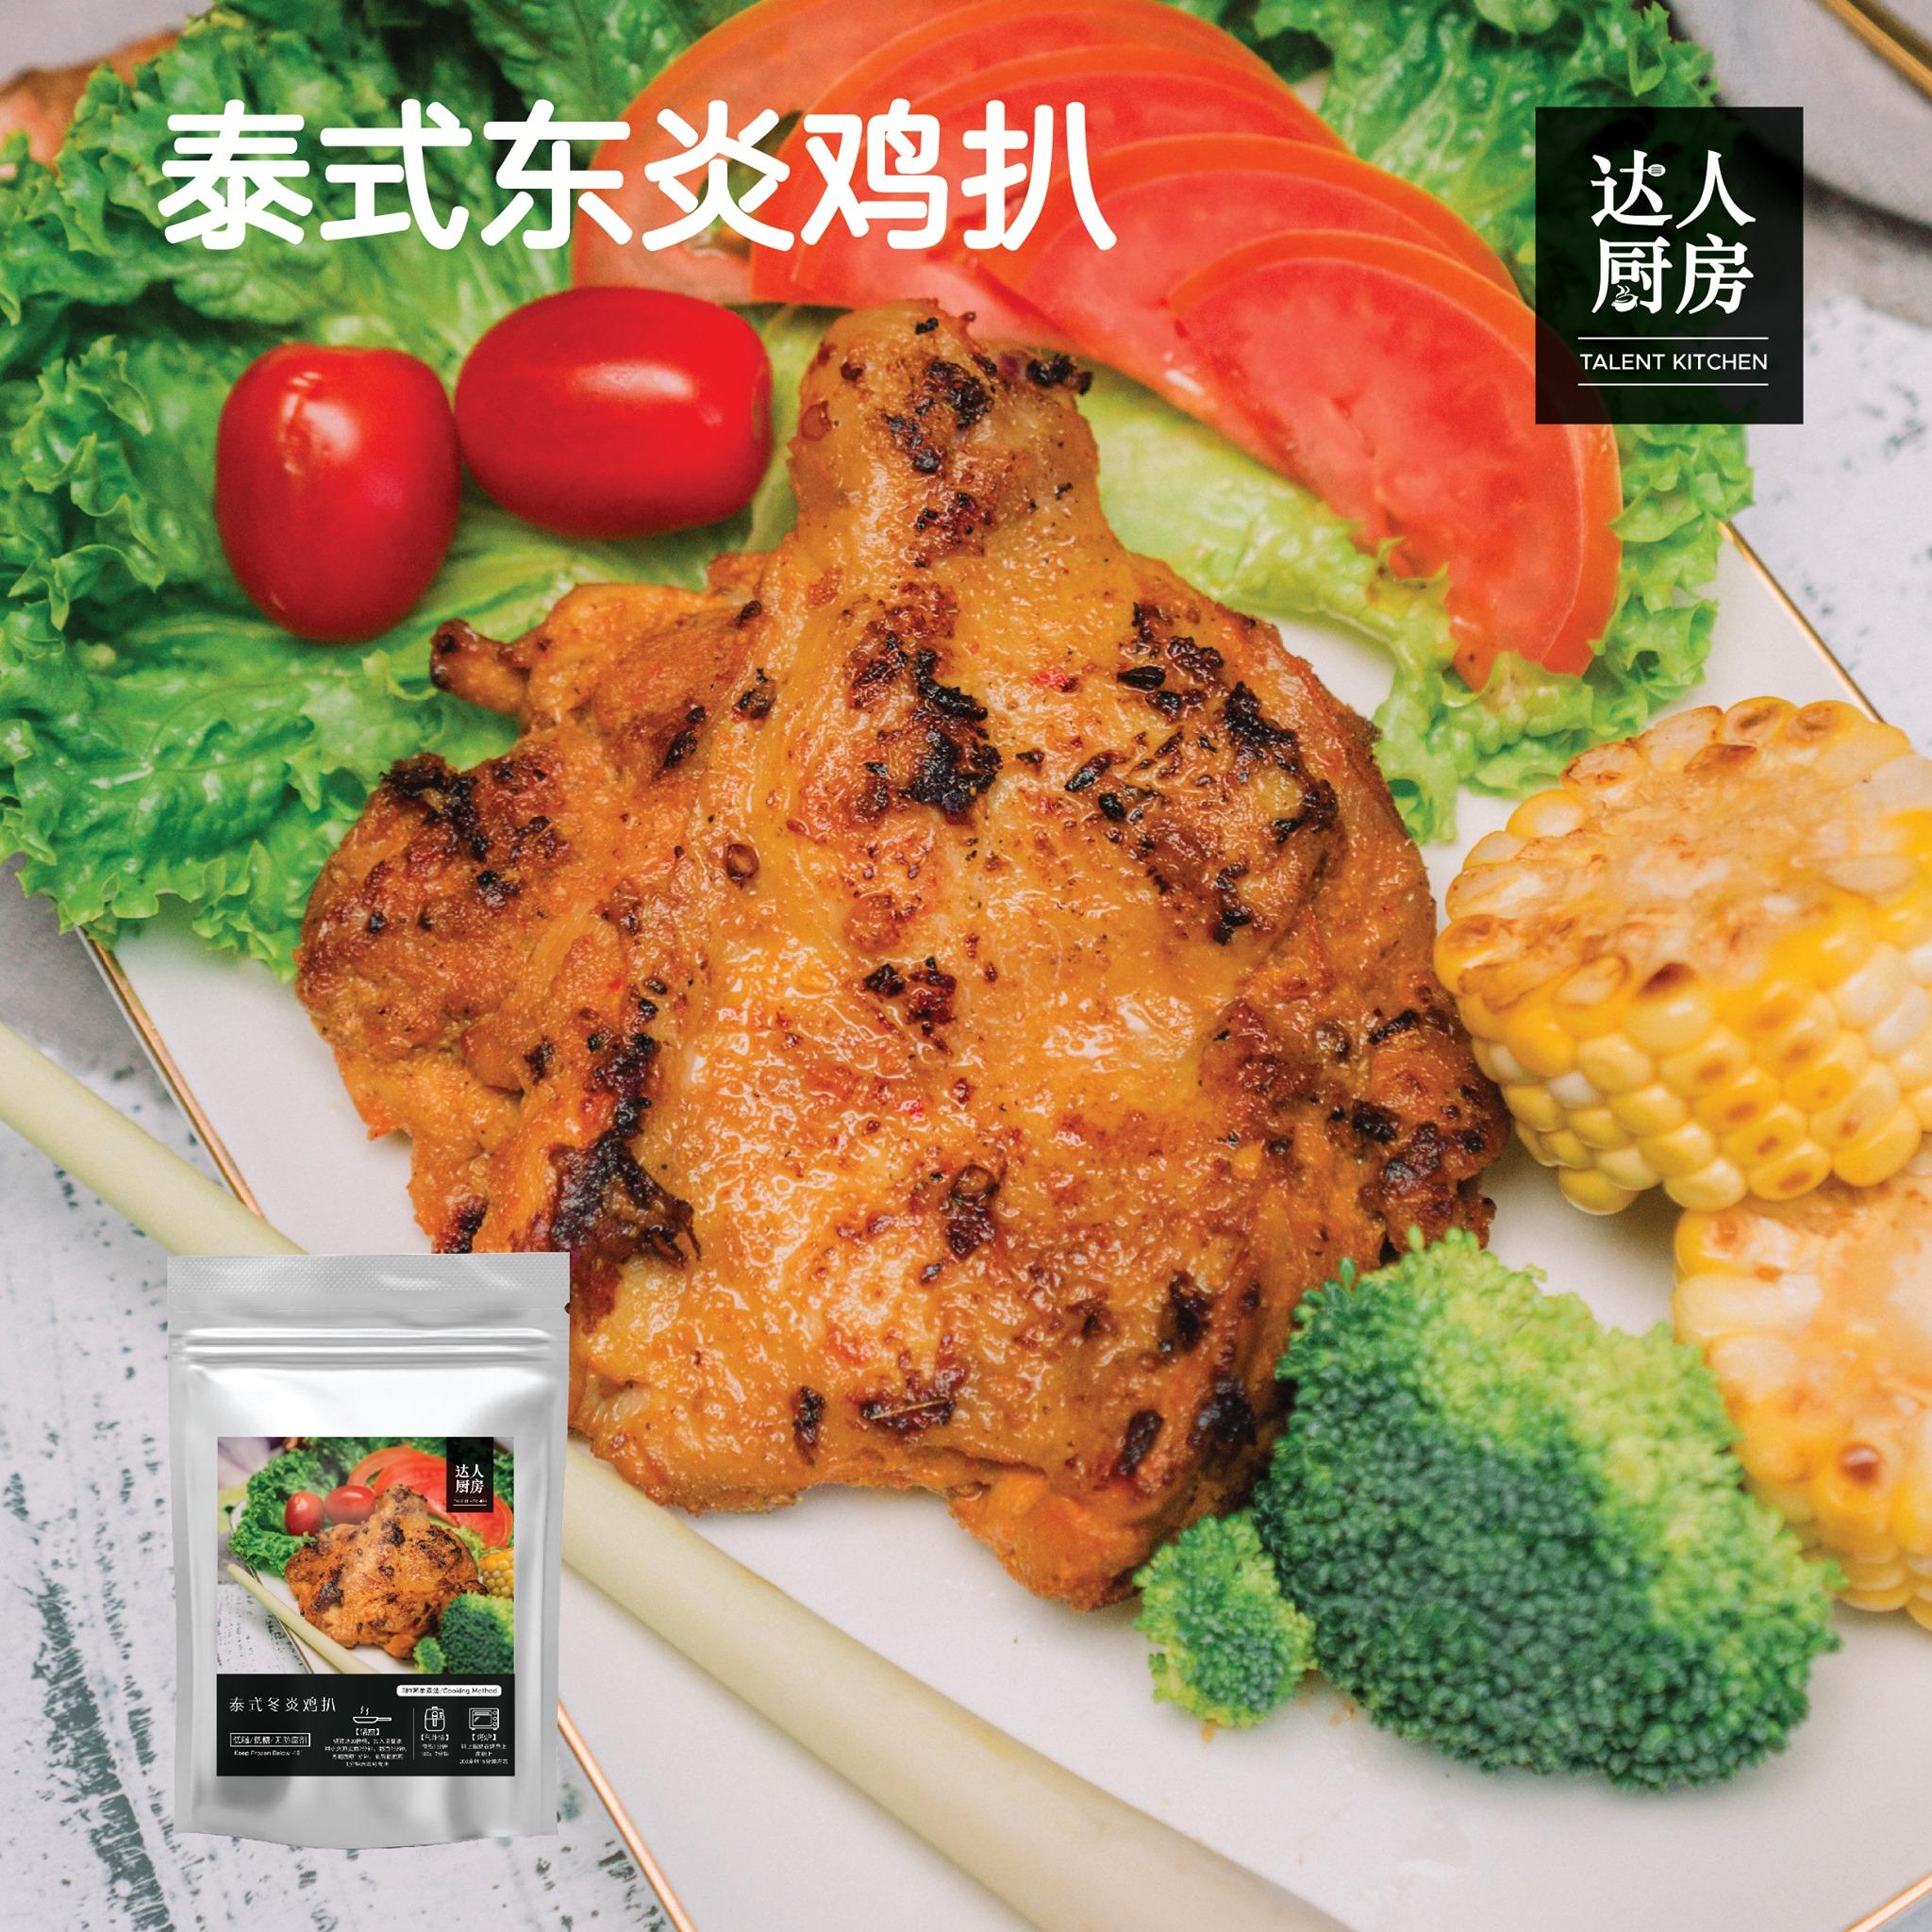 Talent Kitchen 【 达人特制鸡扒系列 】